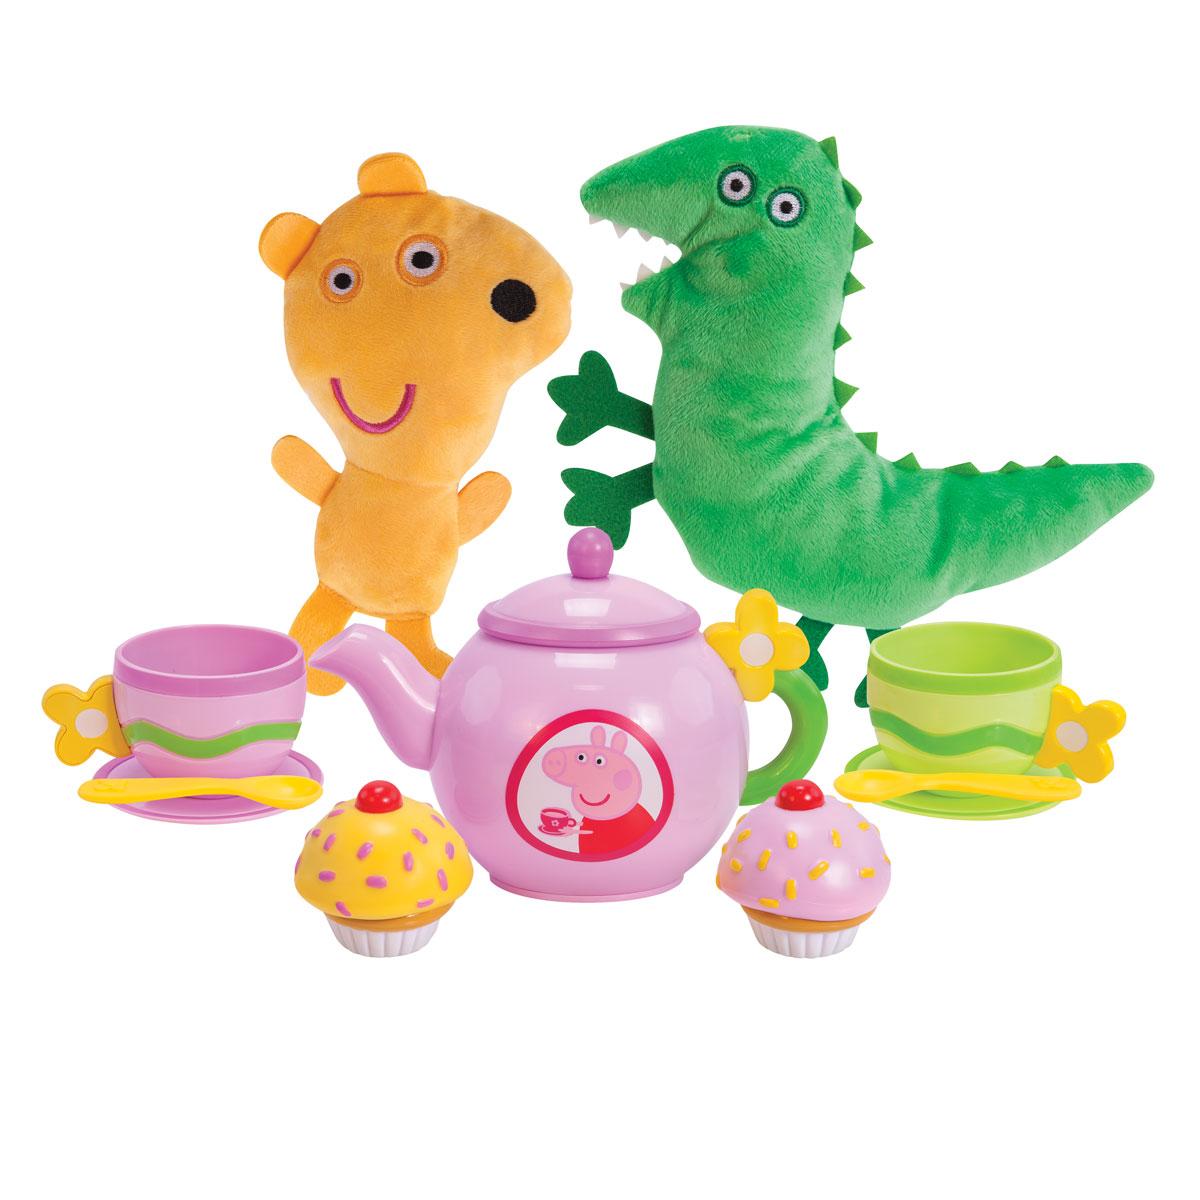 Peppa Pig Tea Party Set